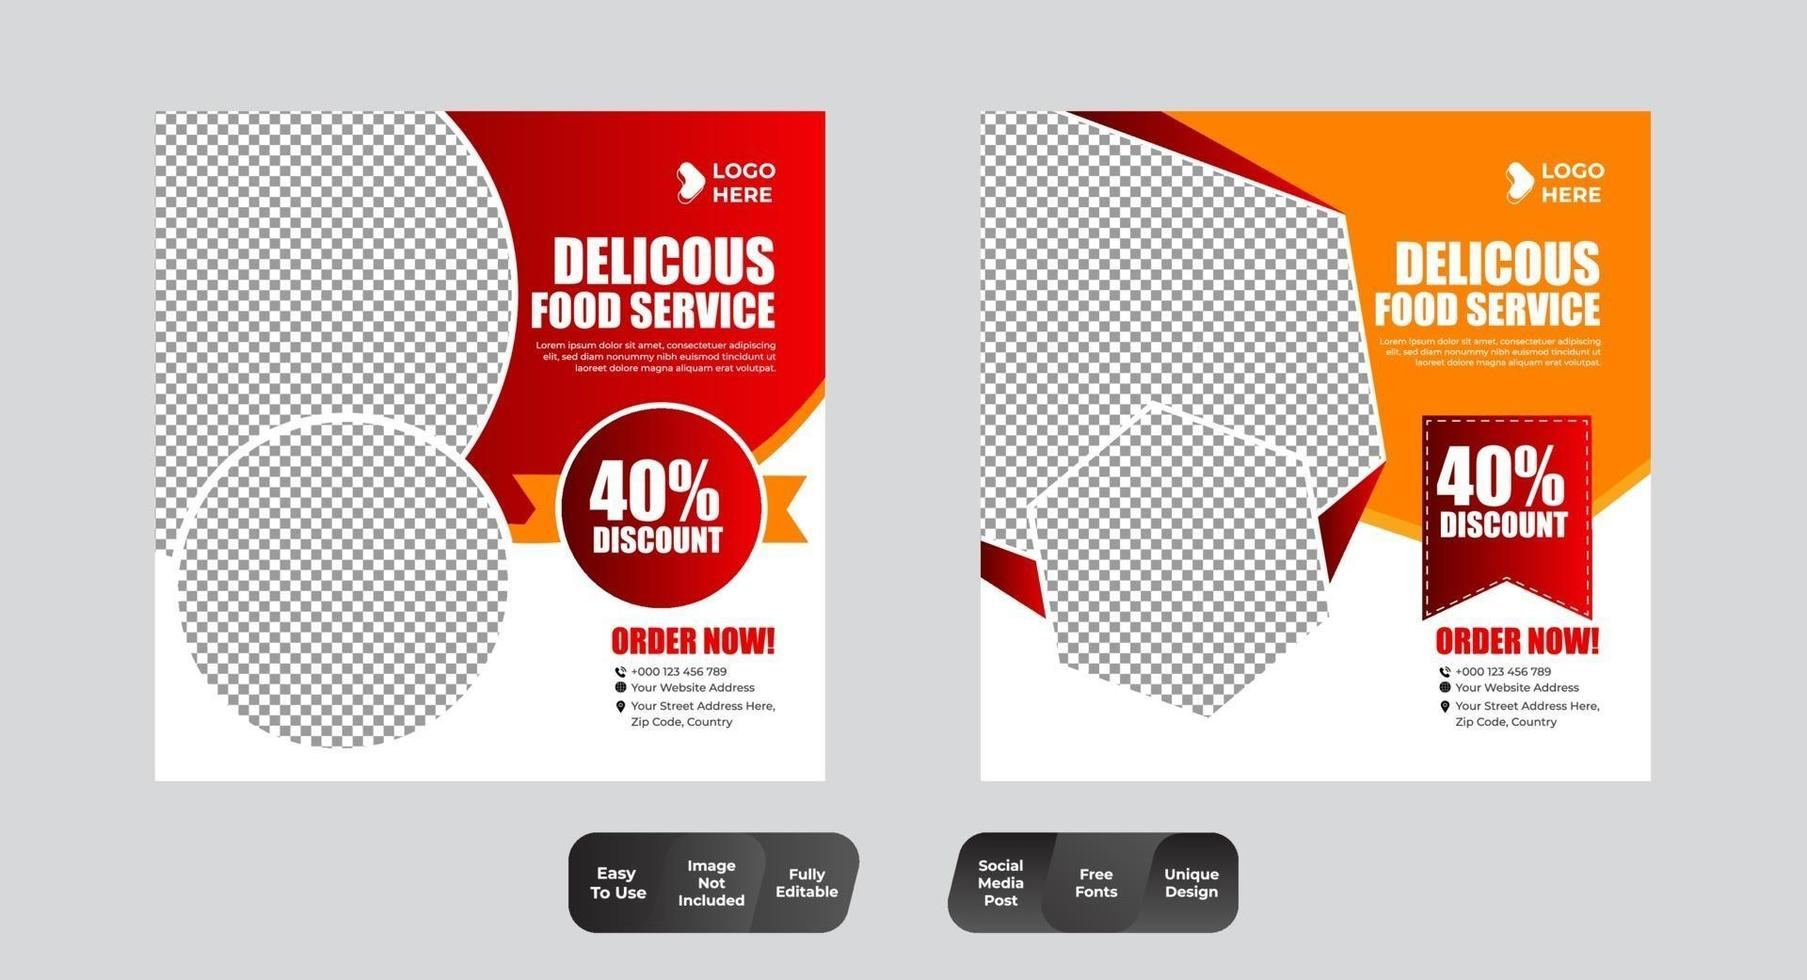 fyrkantig banner mall design bunt vektor